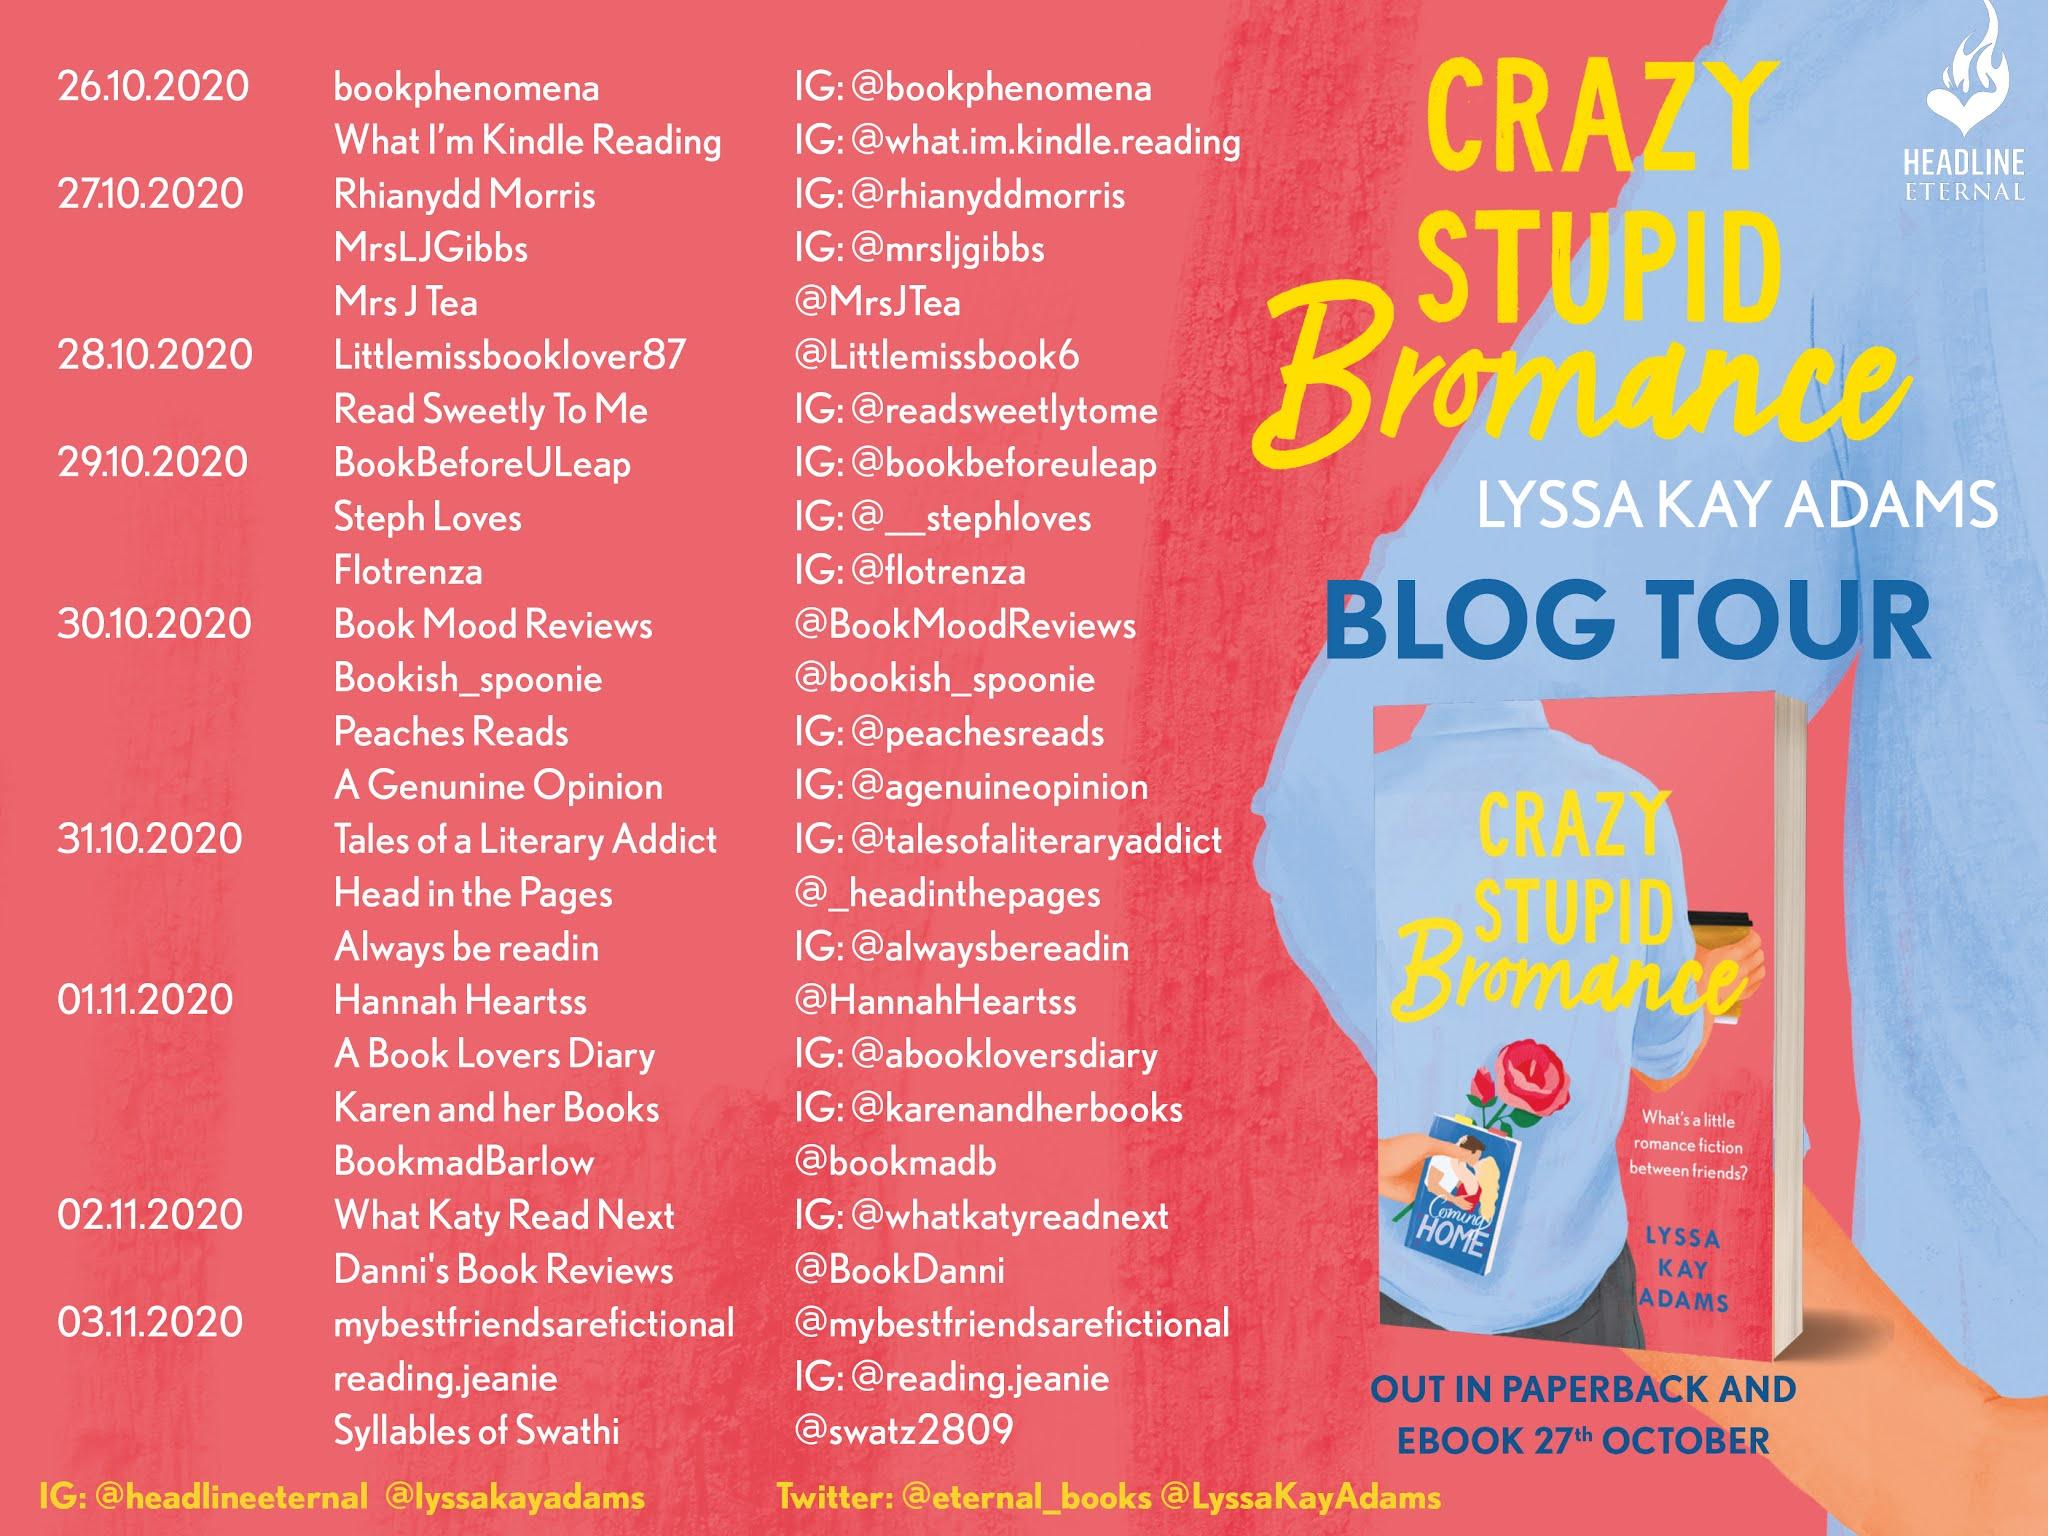 Crazy Stupid Bromance - Lyssa Kay Adams Book Extract | Blog Tour